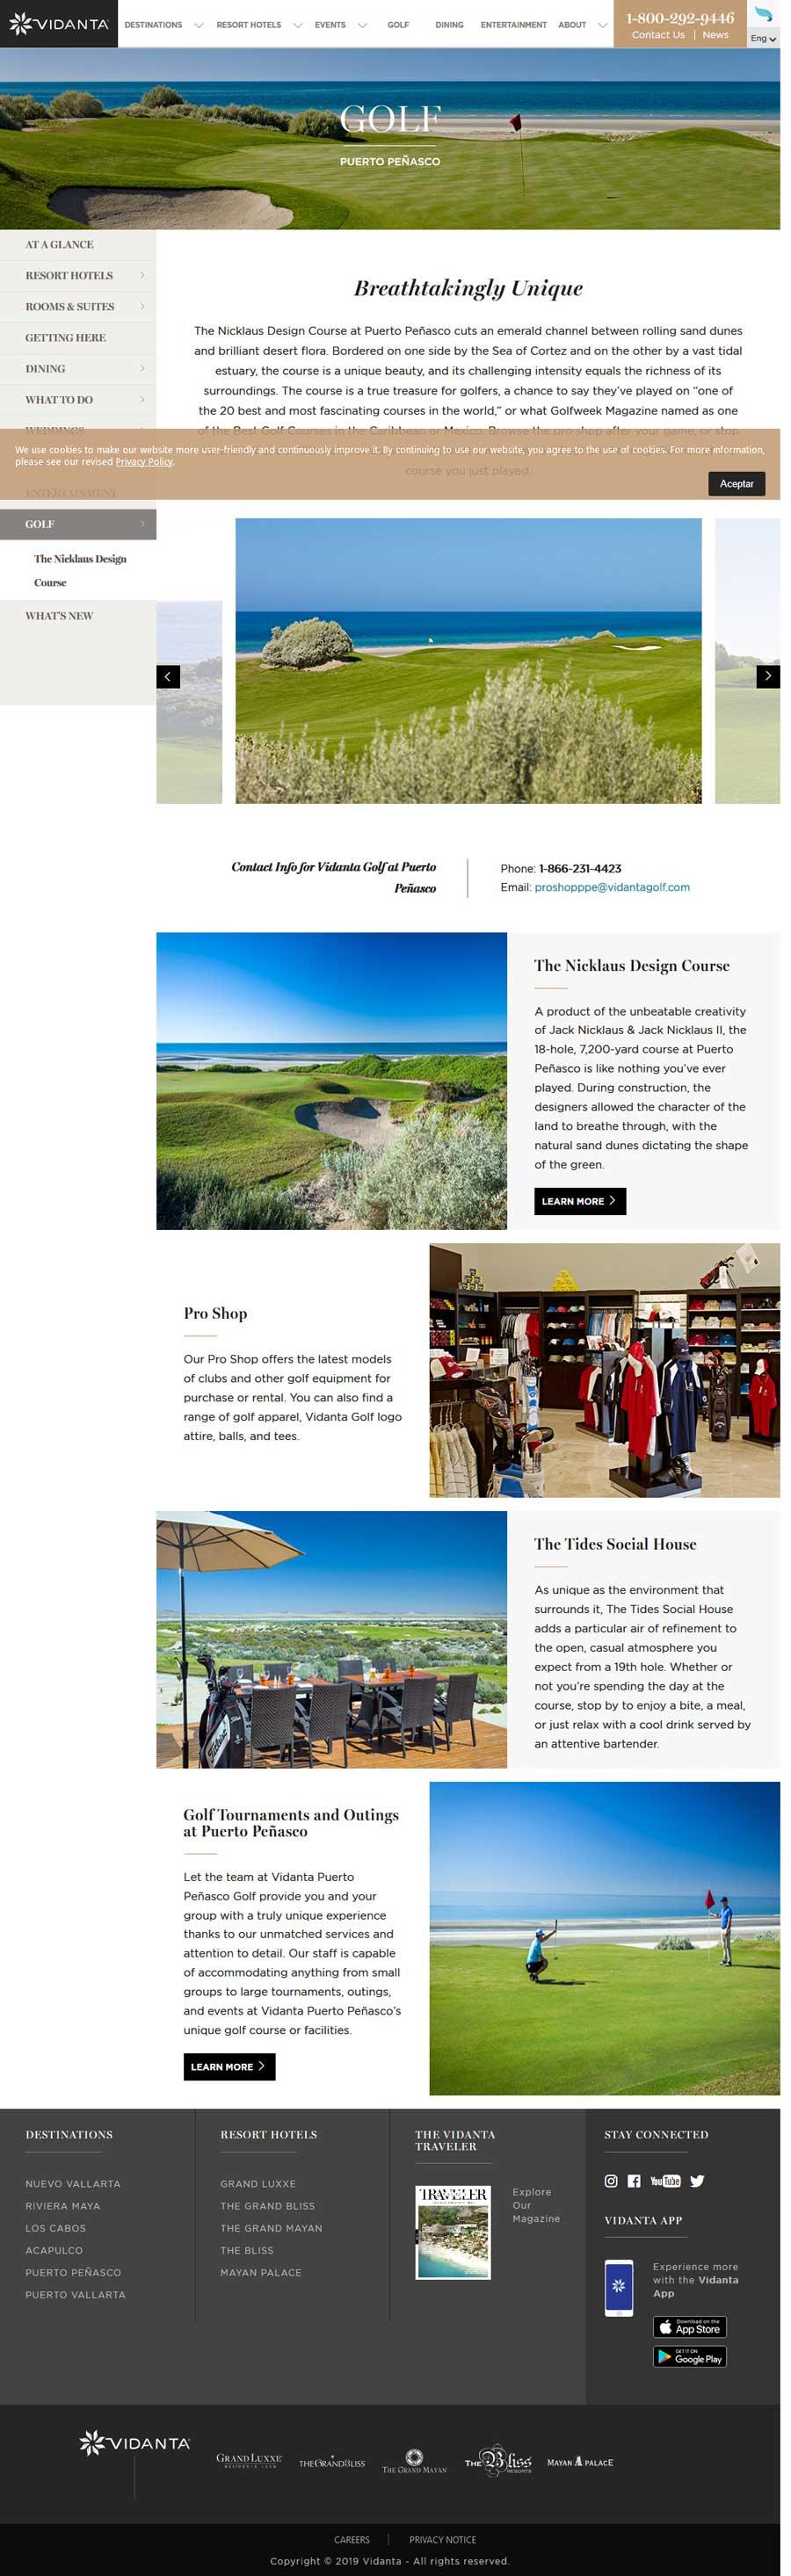 Vidanta Golf in Rocky Point Mexico (Puerto Penasco). Click here to visit Vidanta's Golf website.